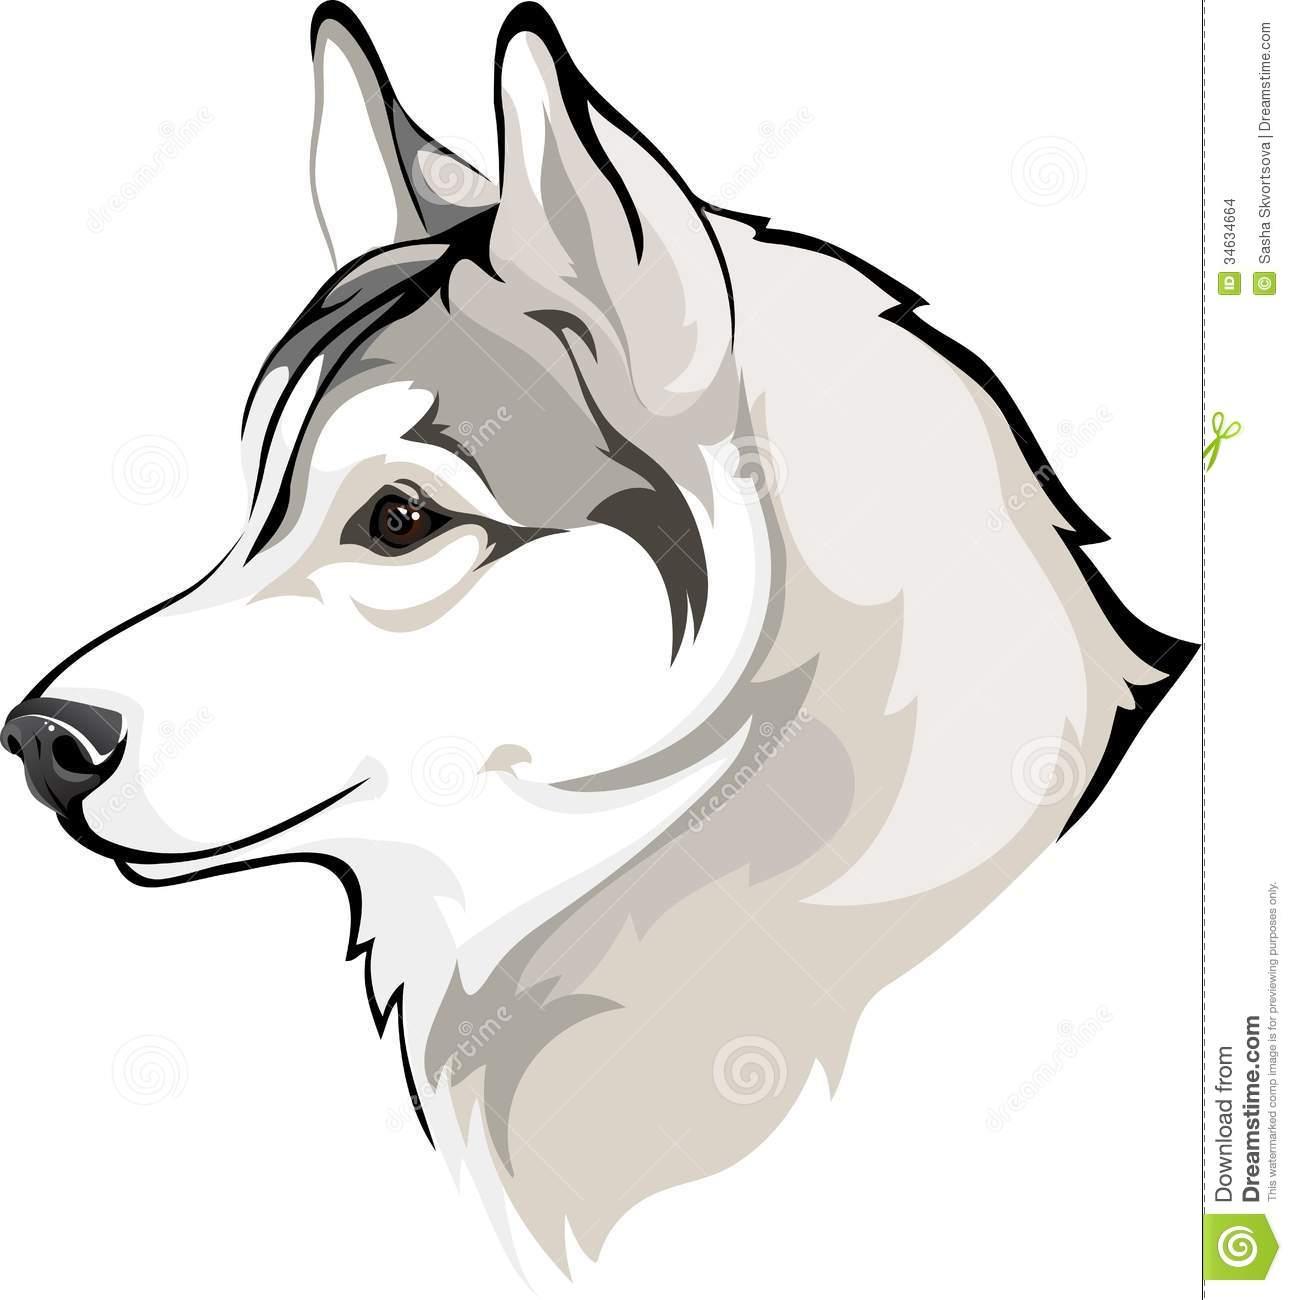 Siberian Husky clipart #7